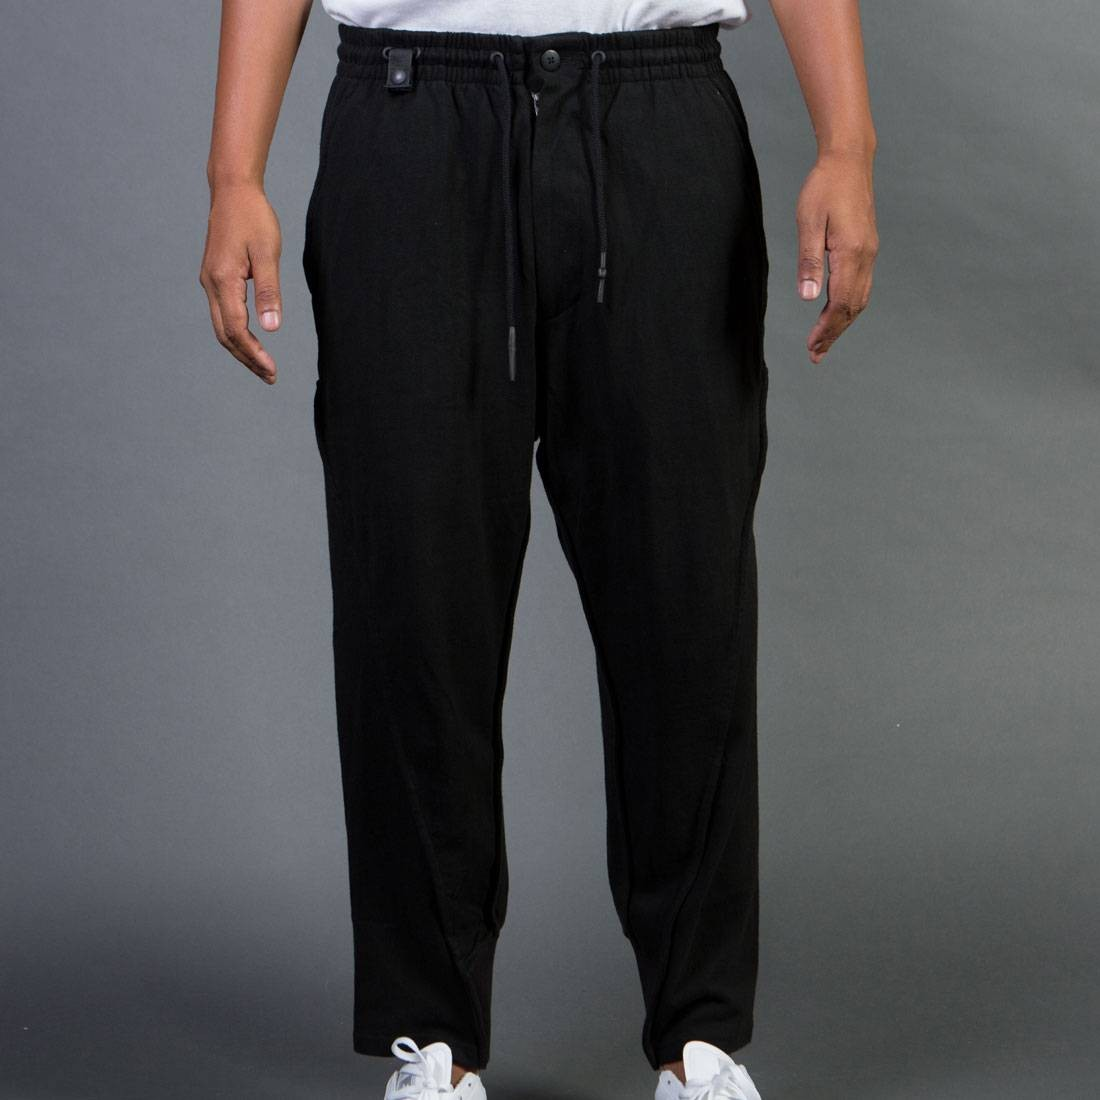 Adidas Y-3 Men Vintage RGL Pant (black / blackened)